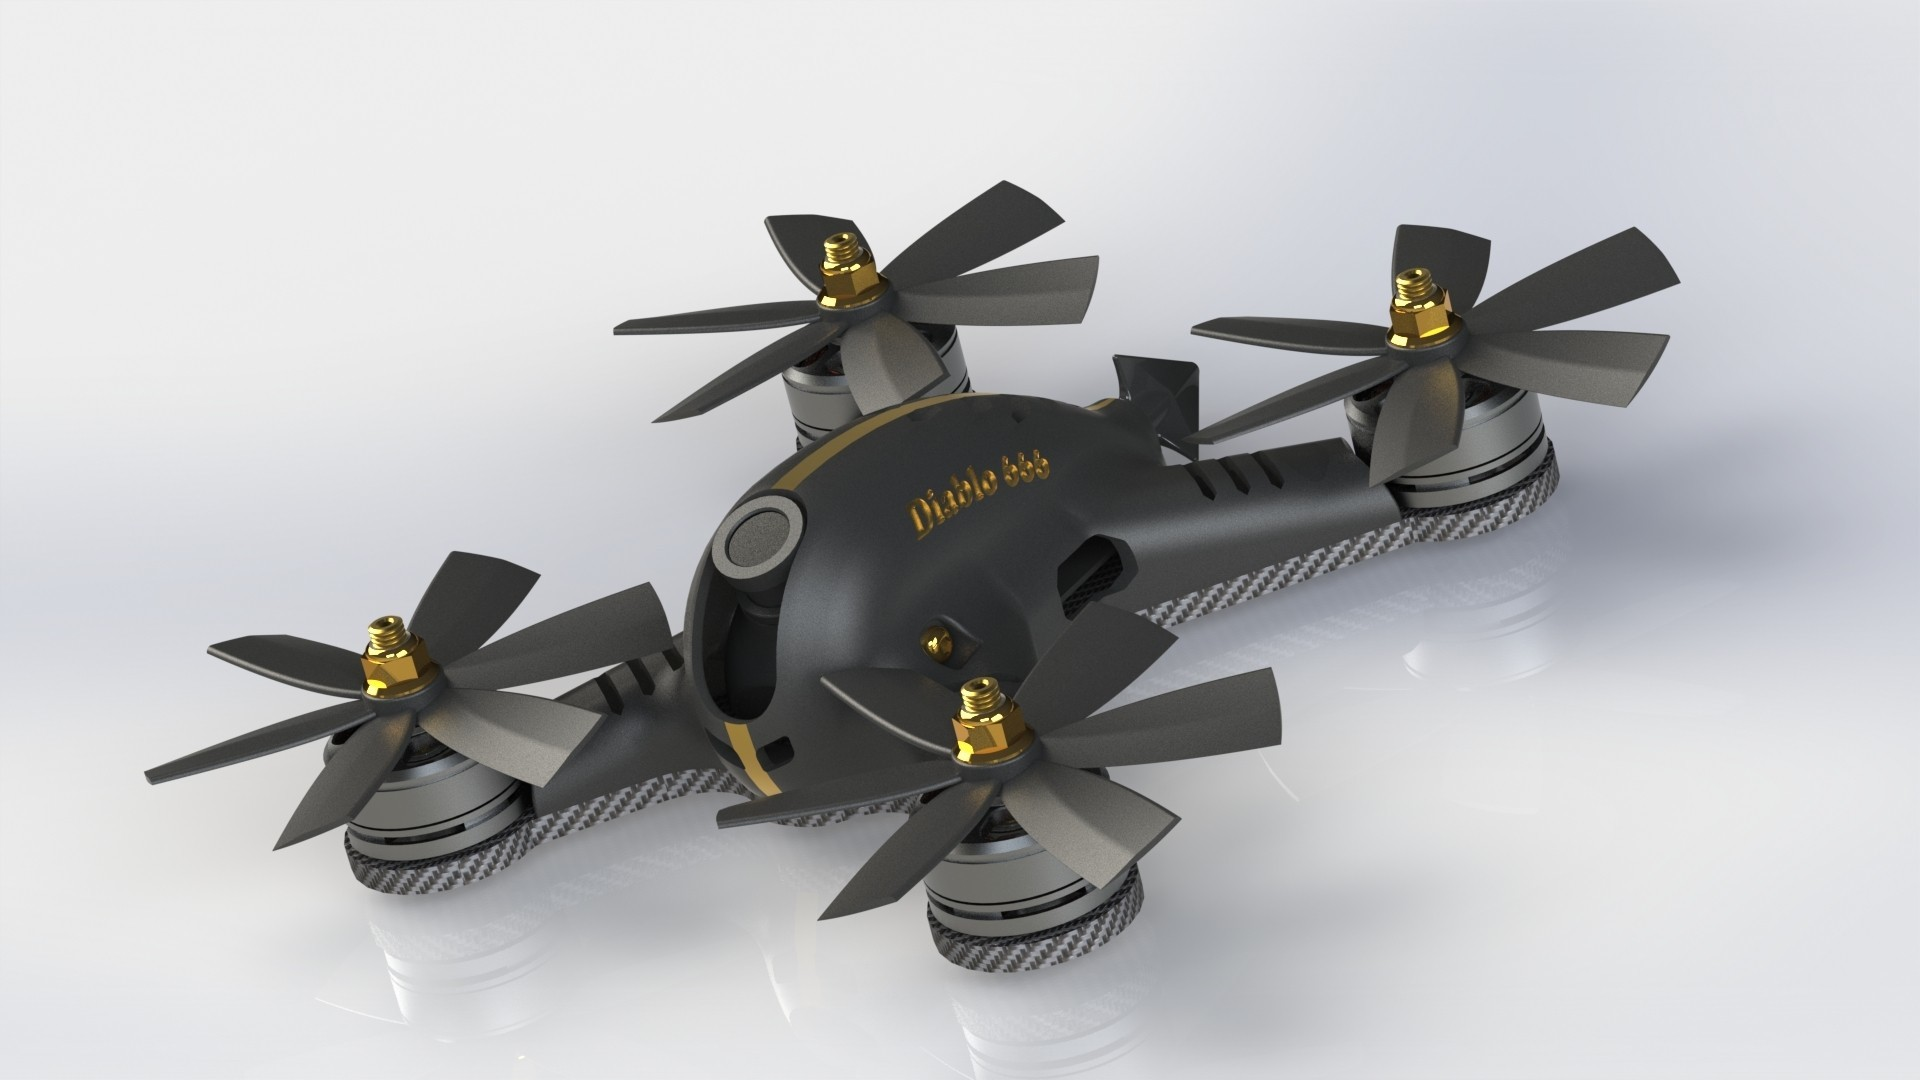 rendu final noir mat.JPG Download STL file FPV racing Diablo 3p 22XX V1 • 3D print design, DamDam3D